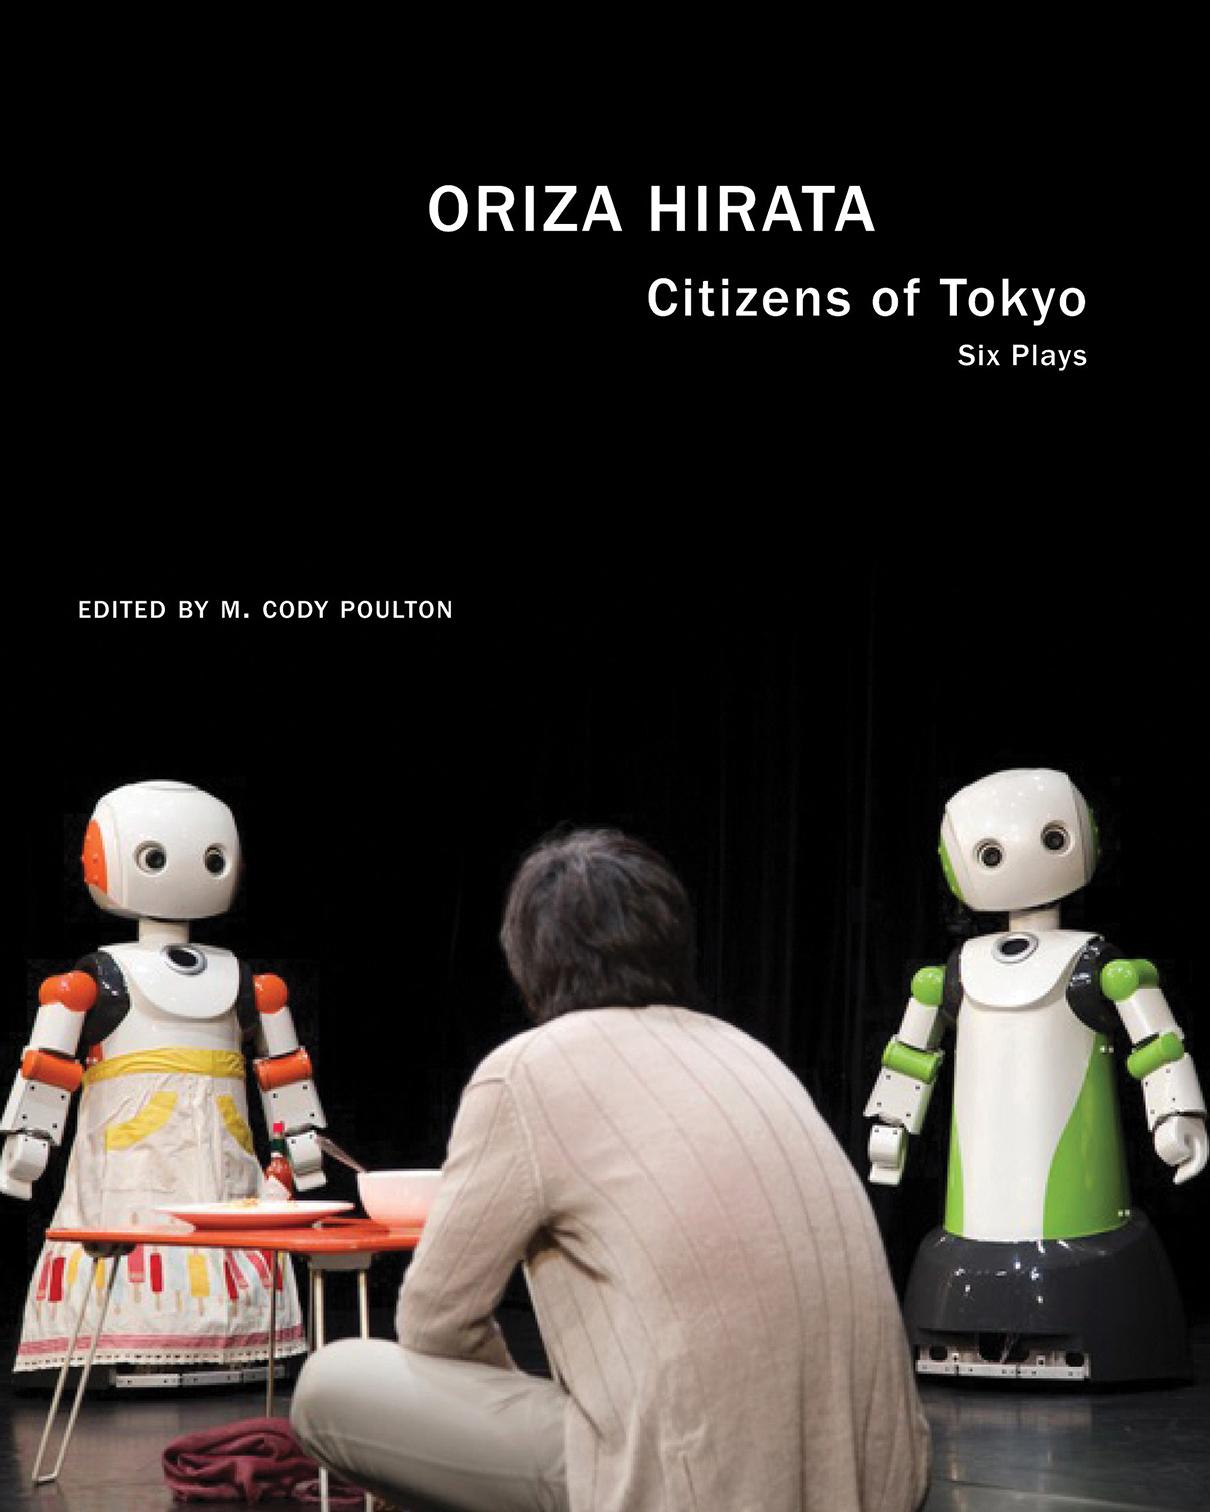 Citizens of Tokyo: Six Plays by Oriza Hirata |  Seagull Books